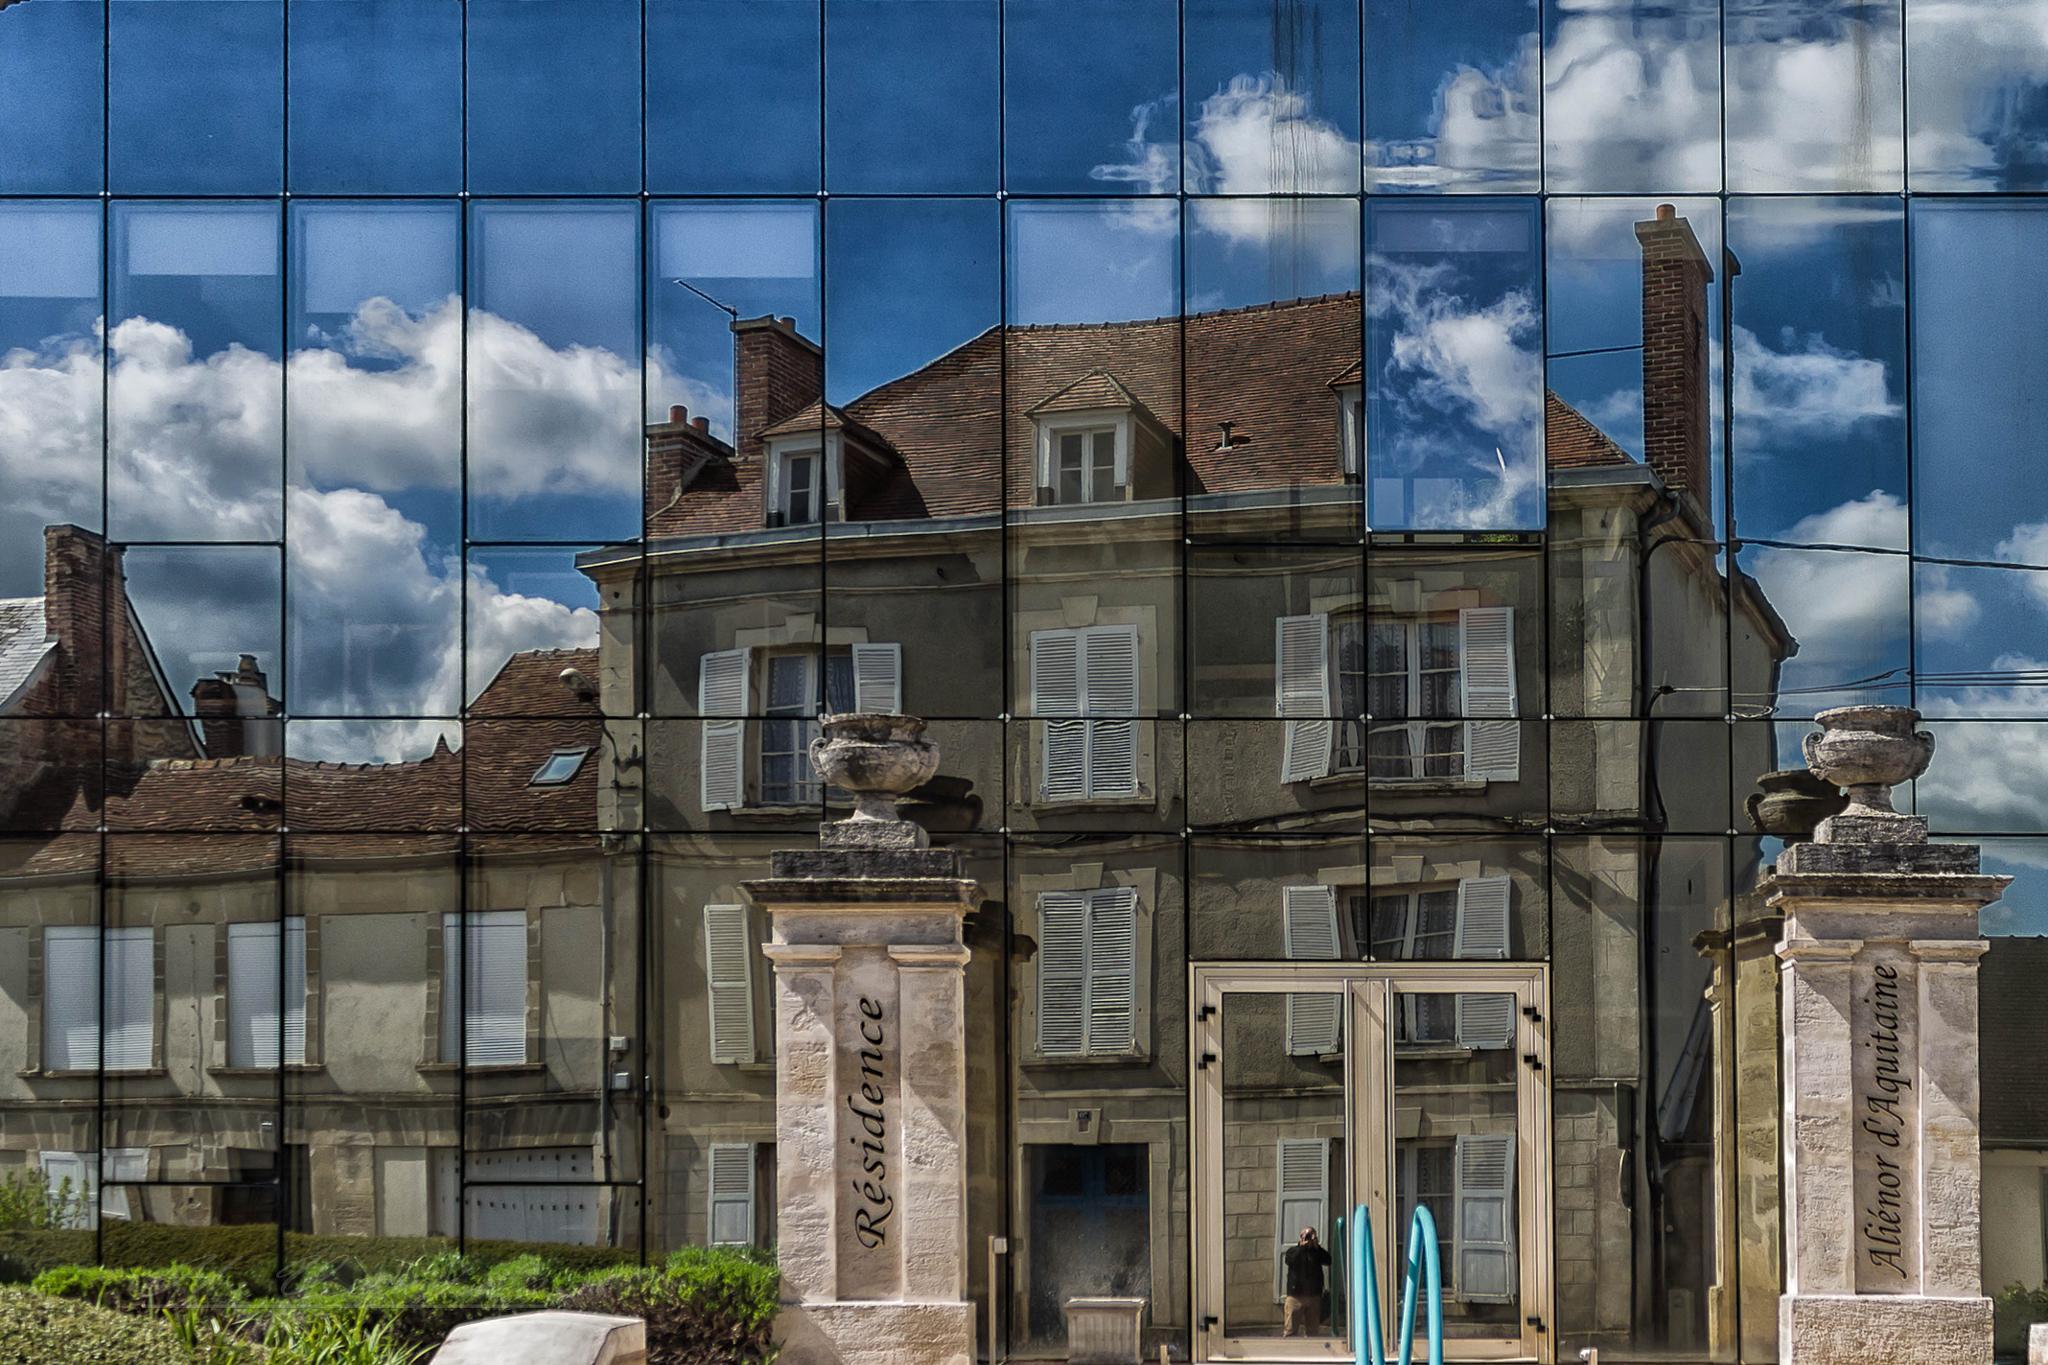 les reflets by hubert61